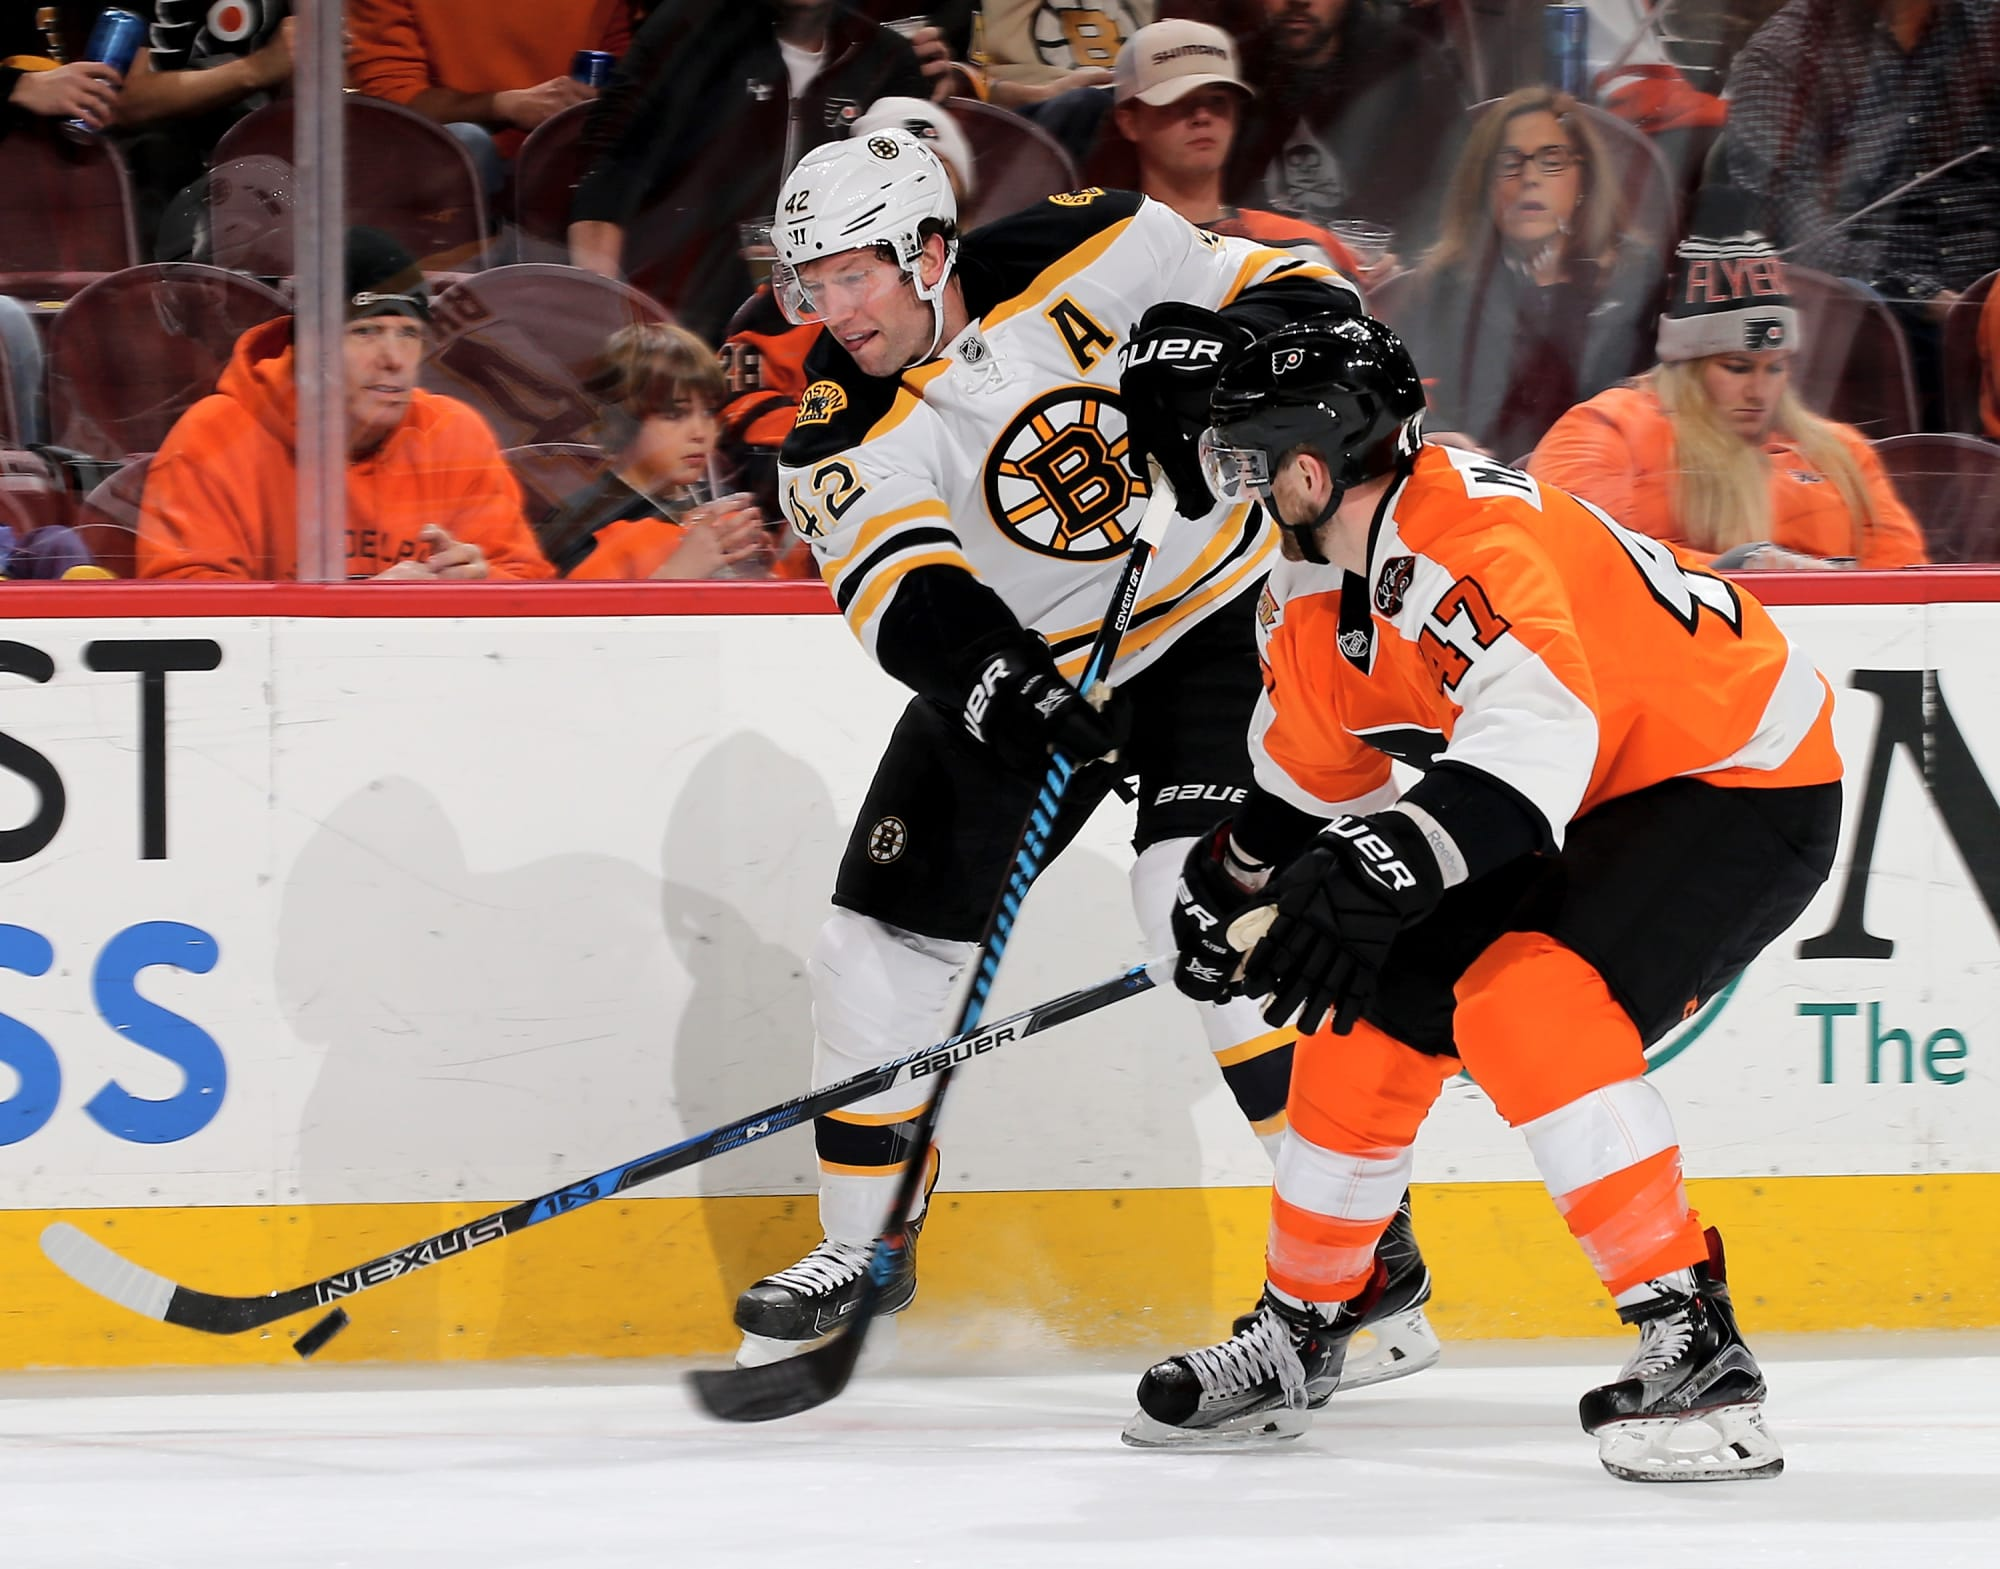 Boston Bruins v. Flyers: September 21st preseason game previewBruins Schedule